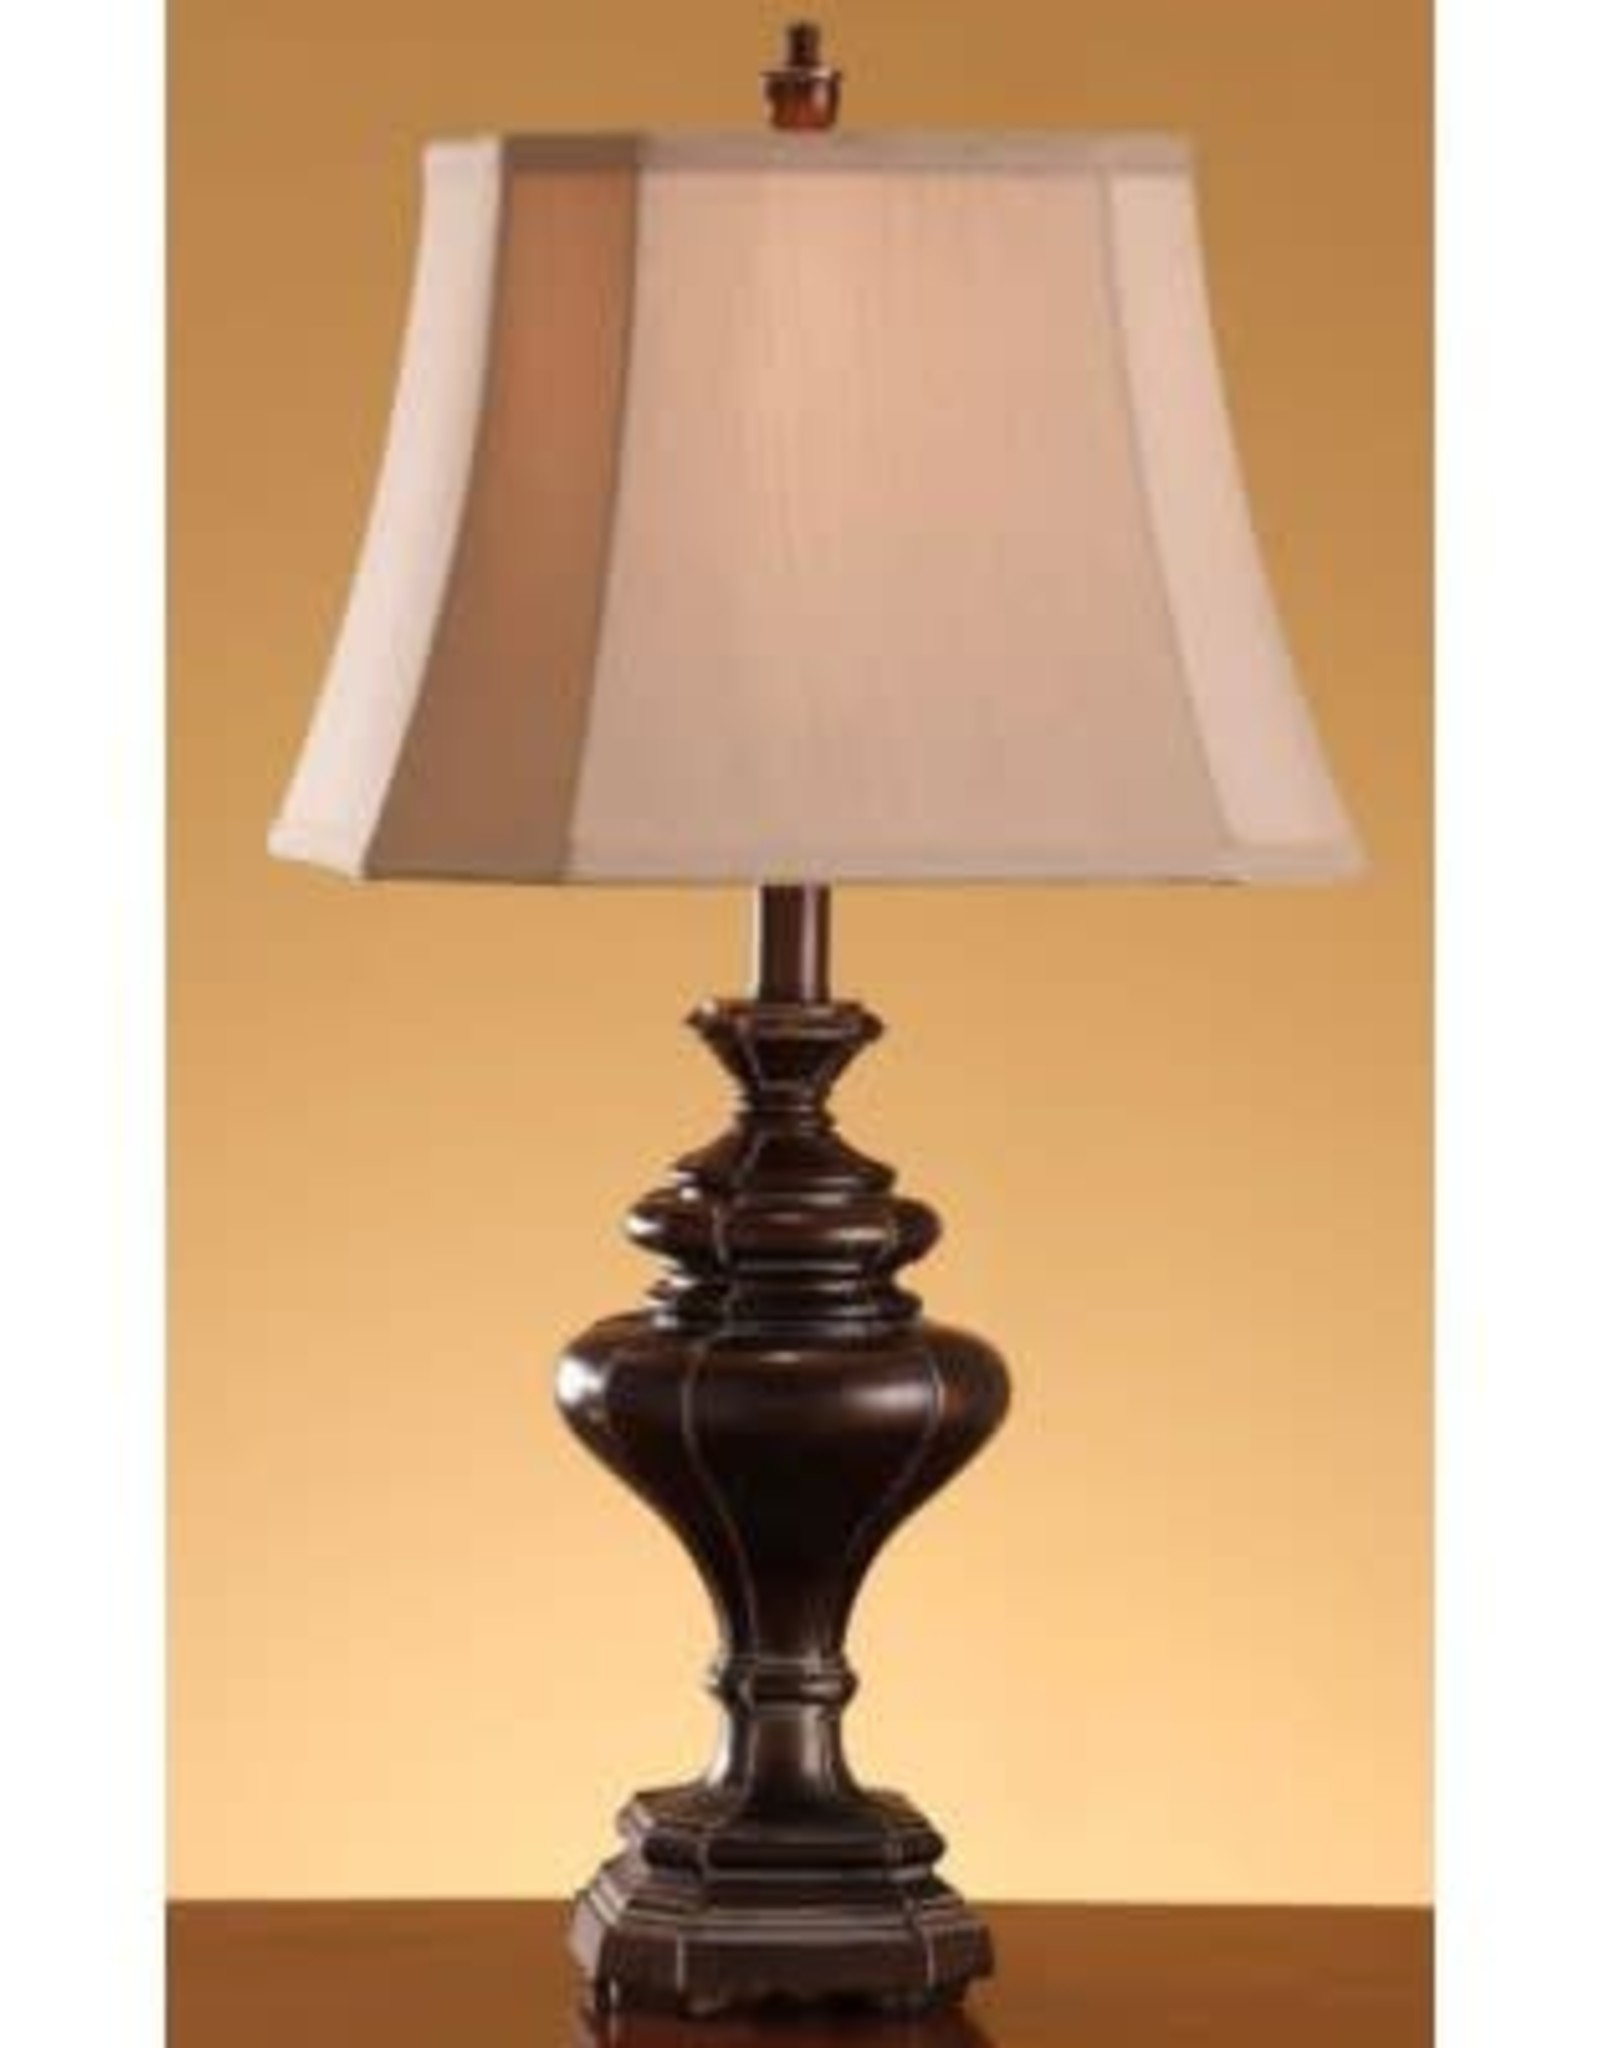 Crestview Ridgeway Oil-Bronze Table Lamp w/ Shade